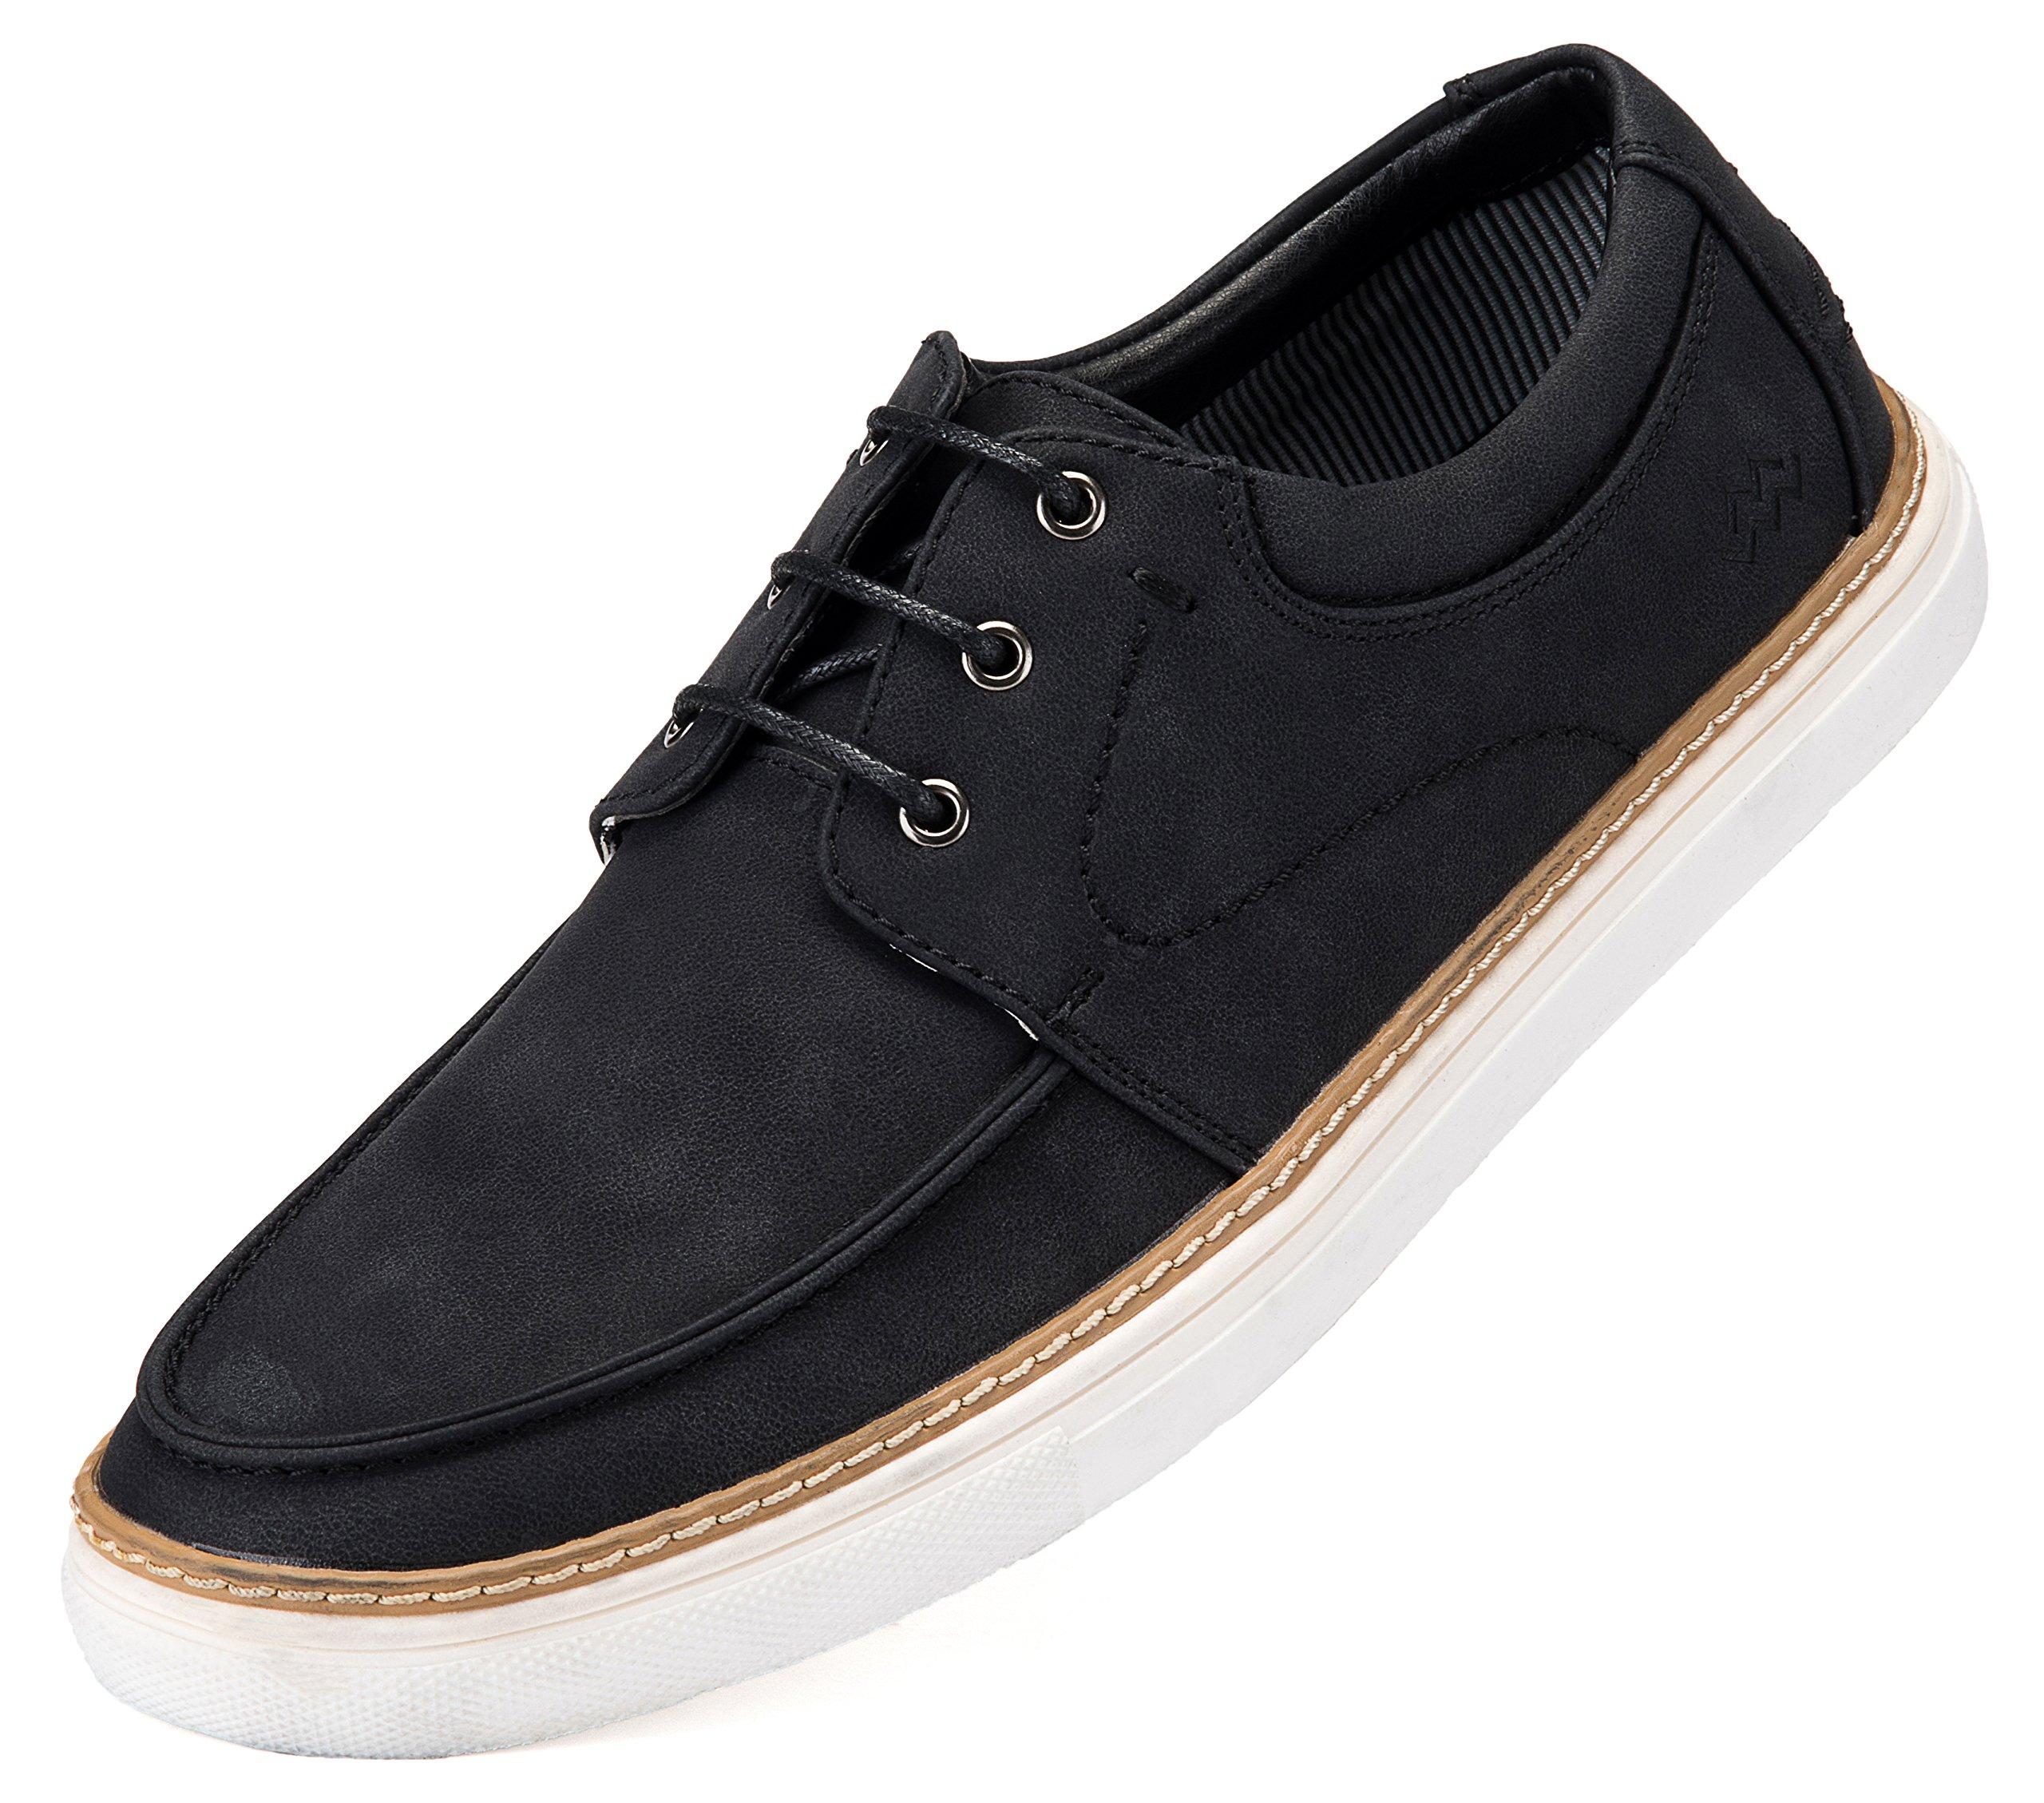 Mio Marino Mens Boat Shoes - Comfortable Fashion Sneakers - Black - Size US 12 | UK 11.5 | EU 45